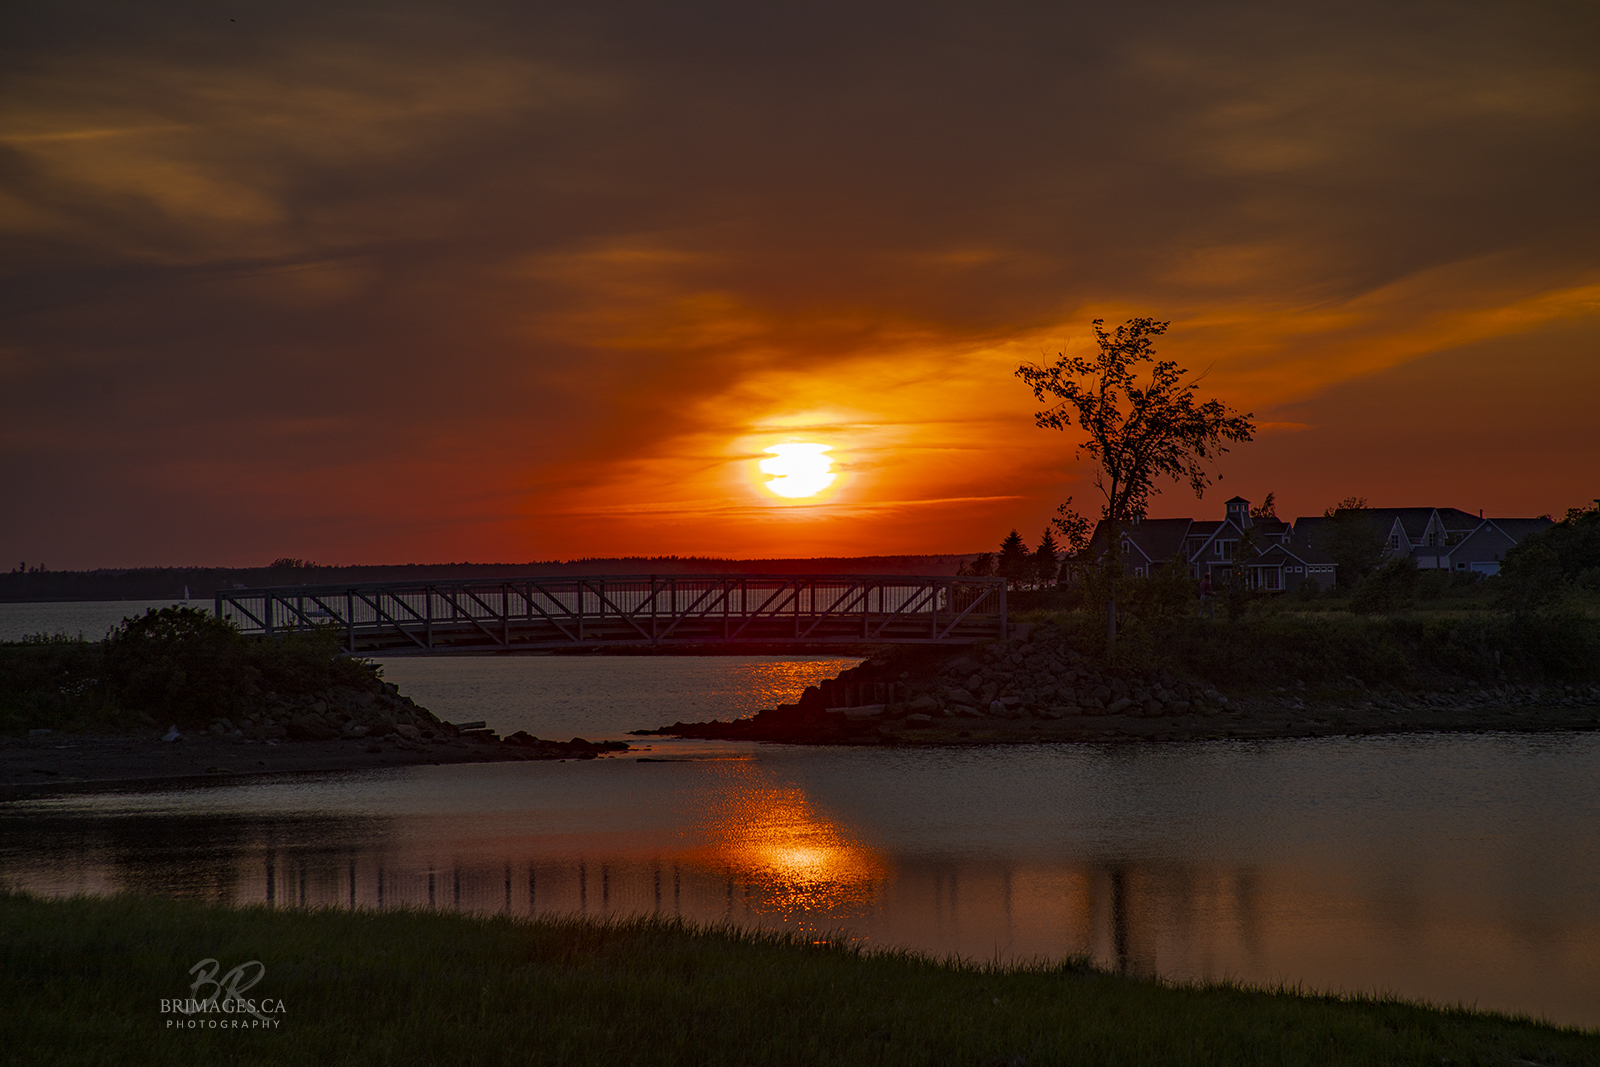 sunset-pointe-du-chene-new-brunswick-canada (2)-BRimages.ca